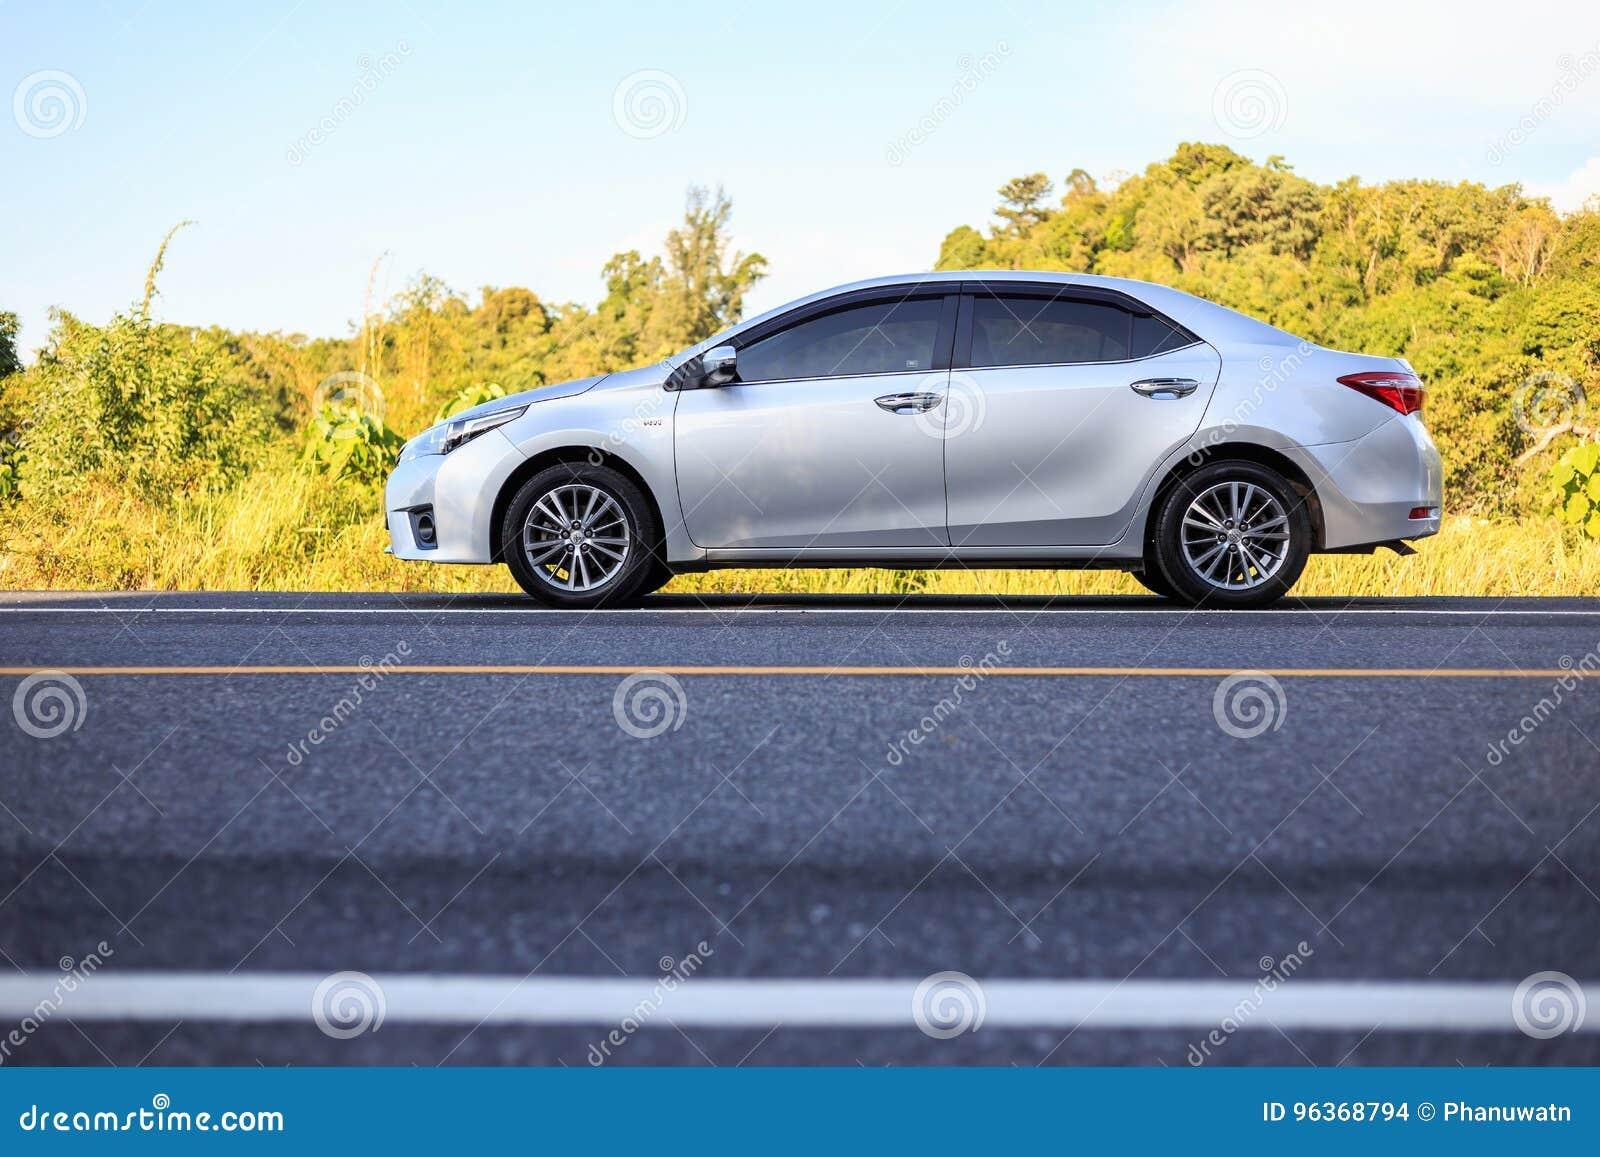 PHUKET THAILAND - JUNI 16: Toyota Corolla Altis parkering på